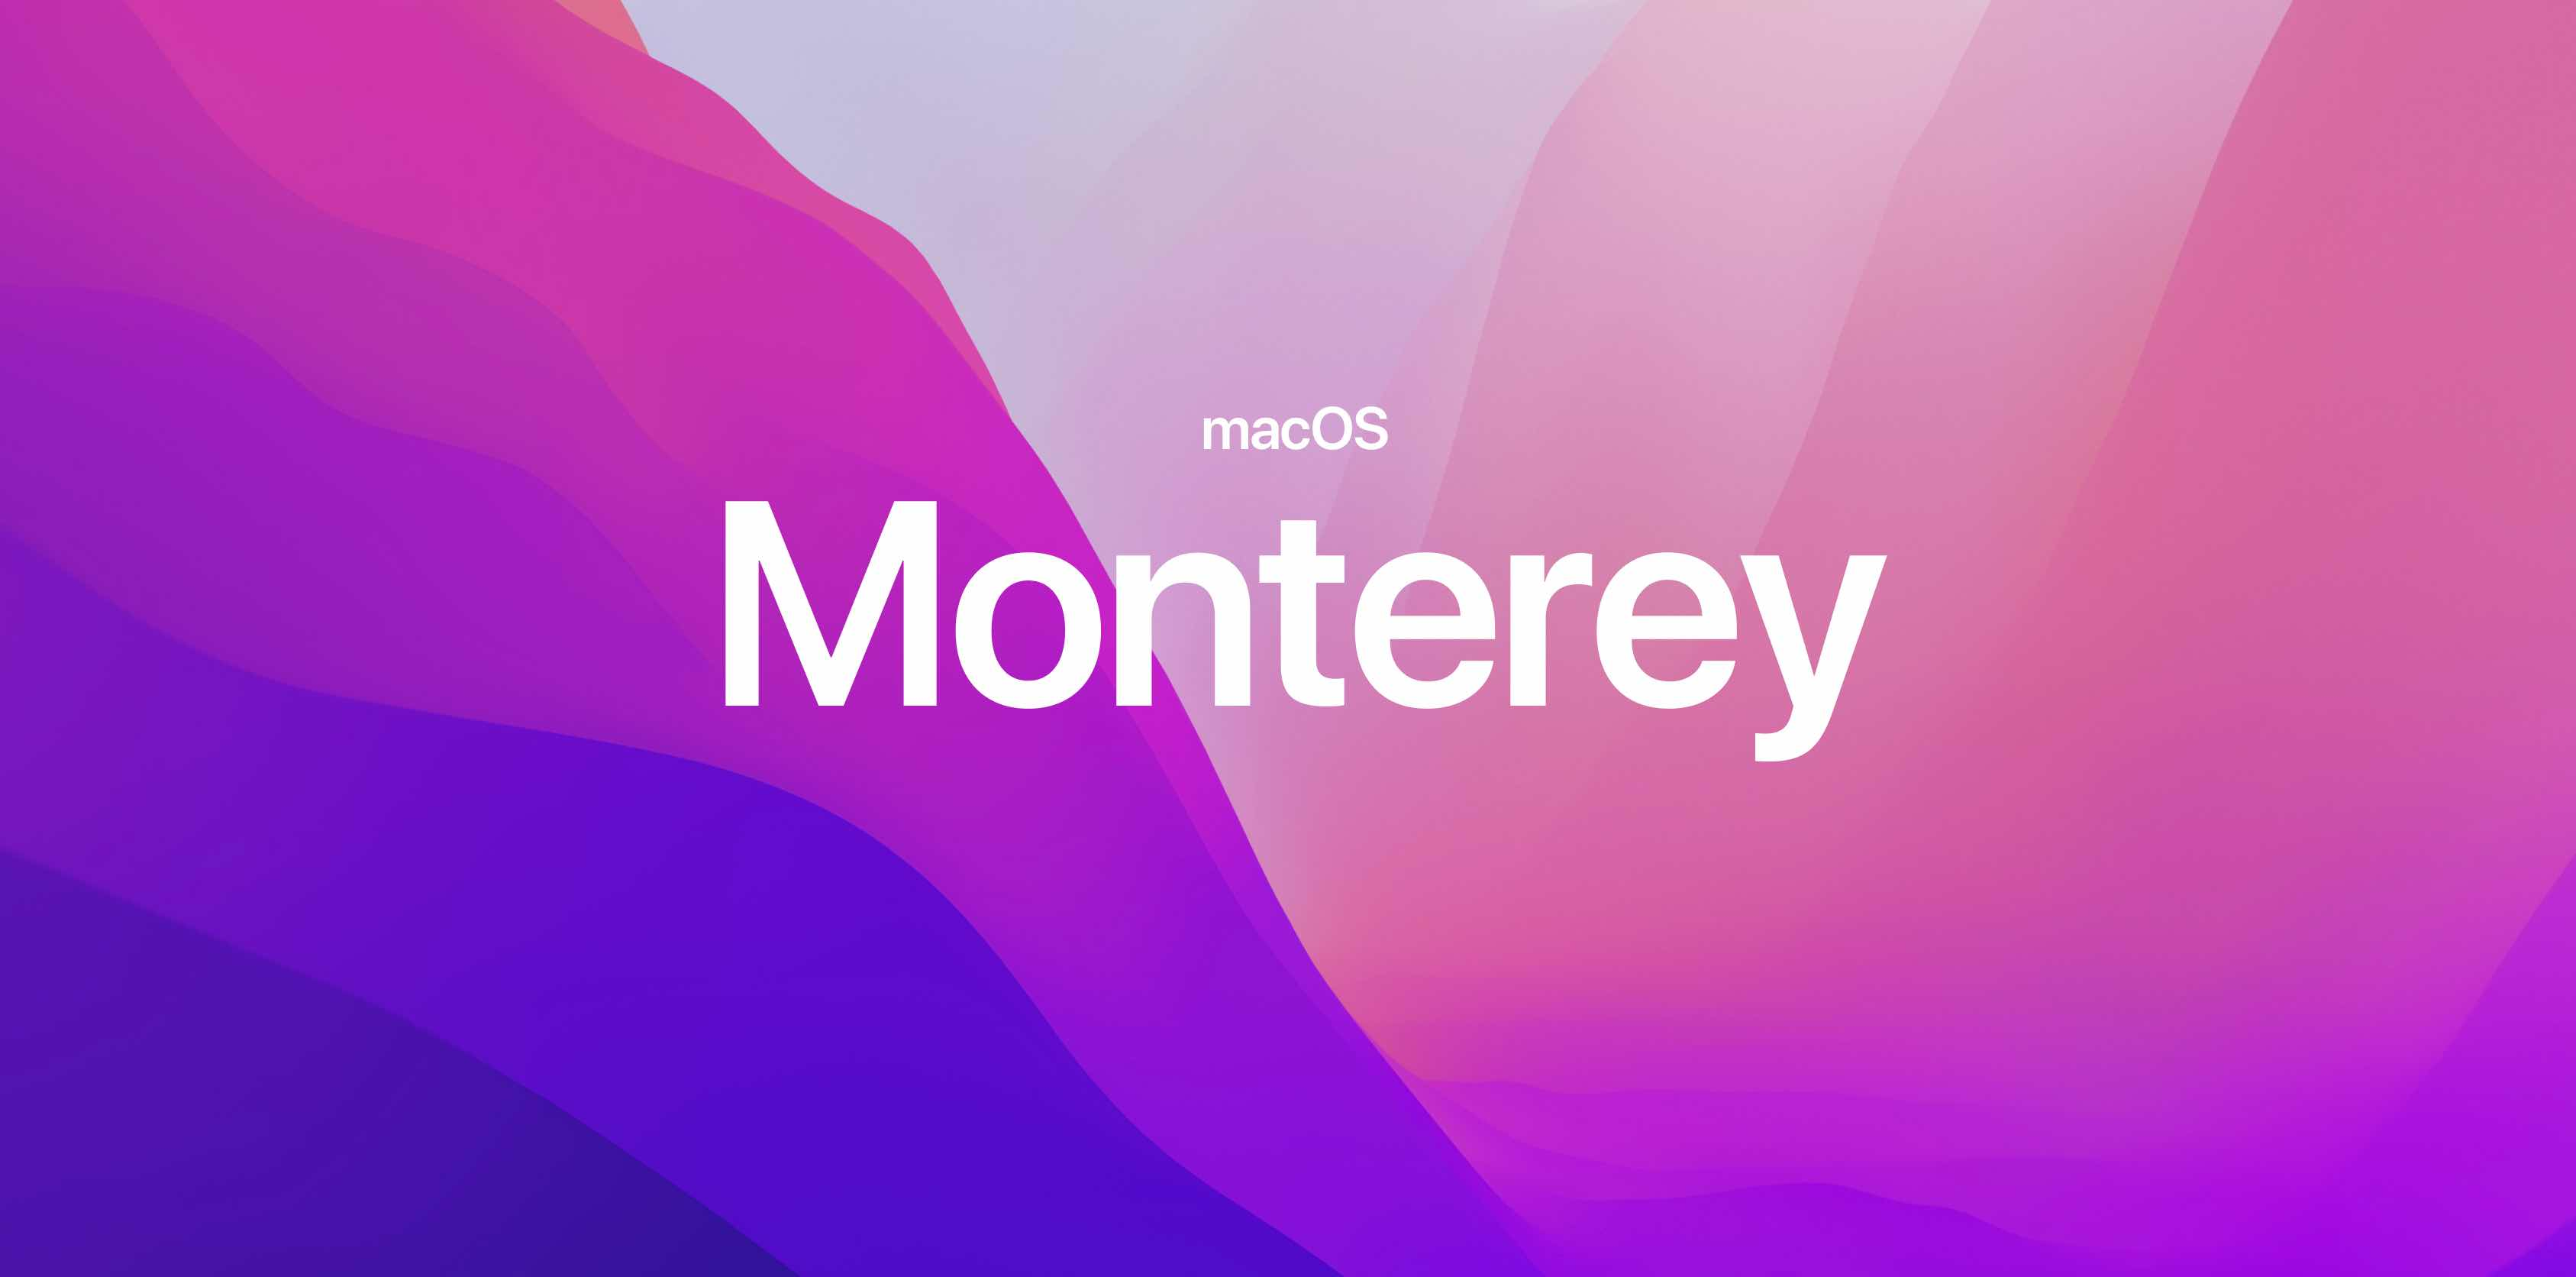 Comment installer macOS Monterey sur Mac